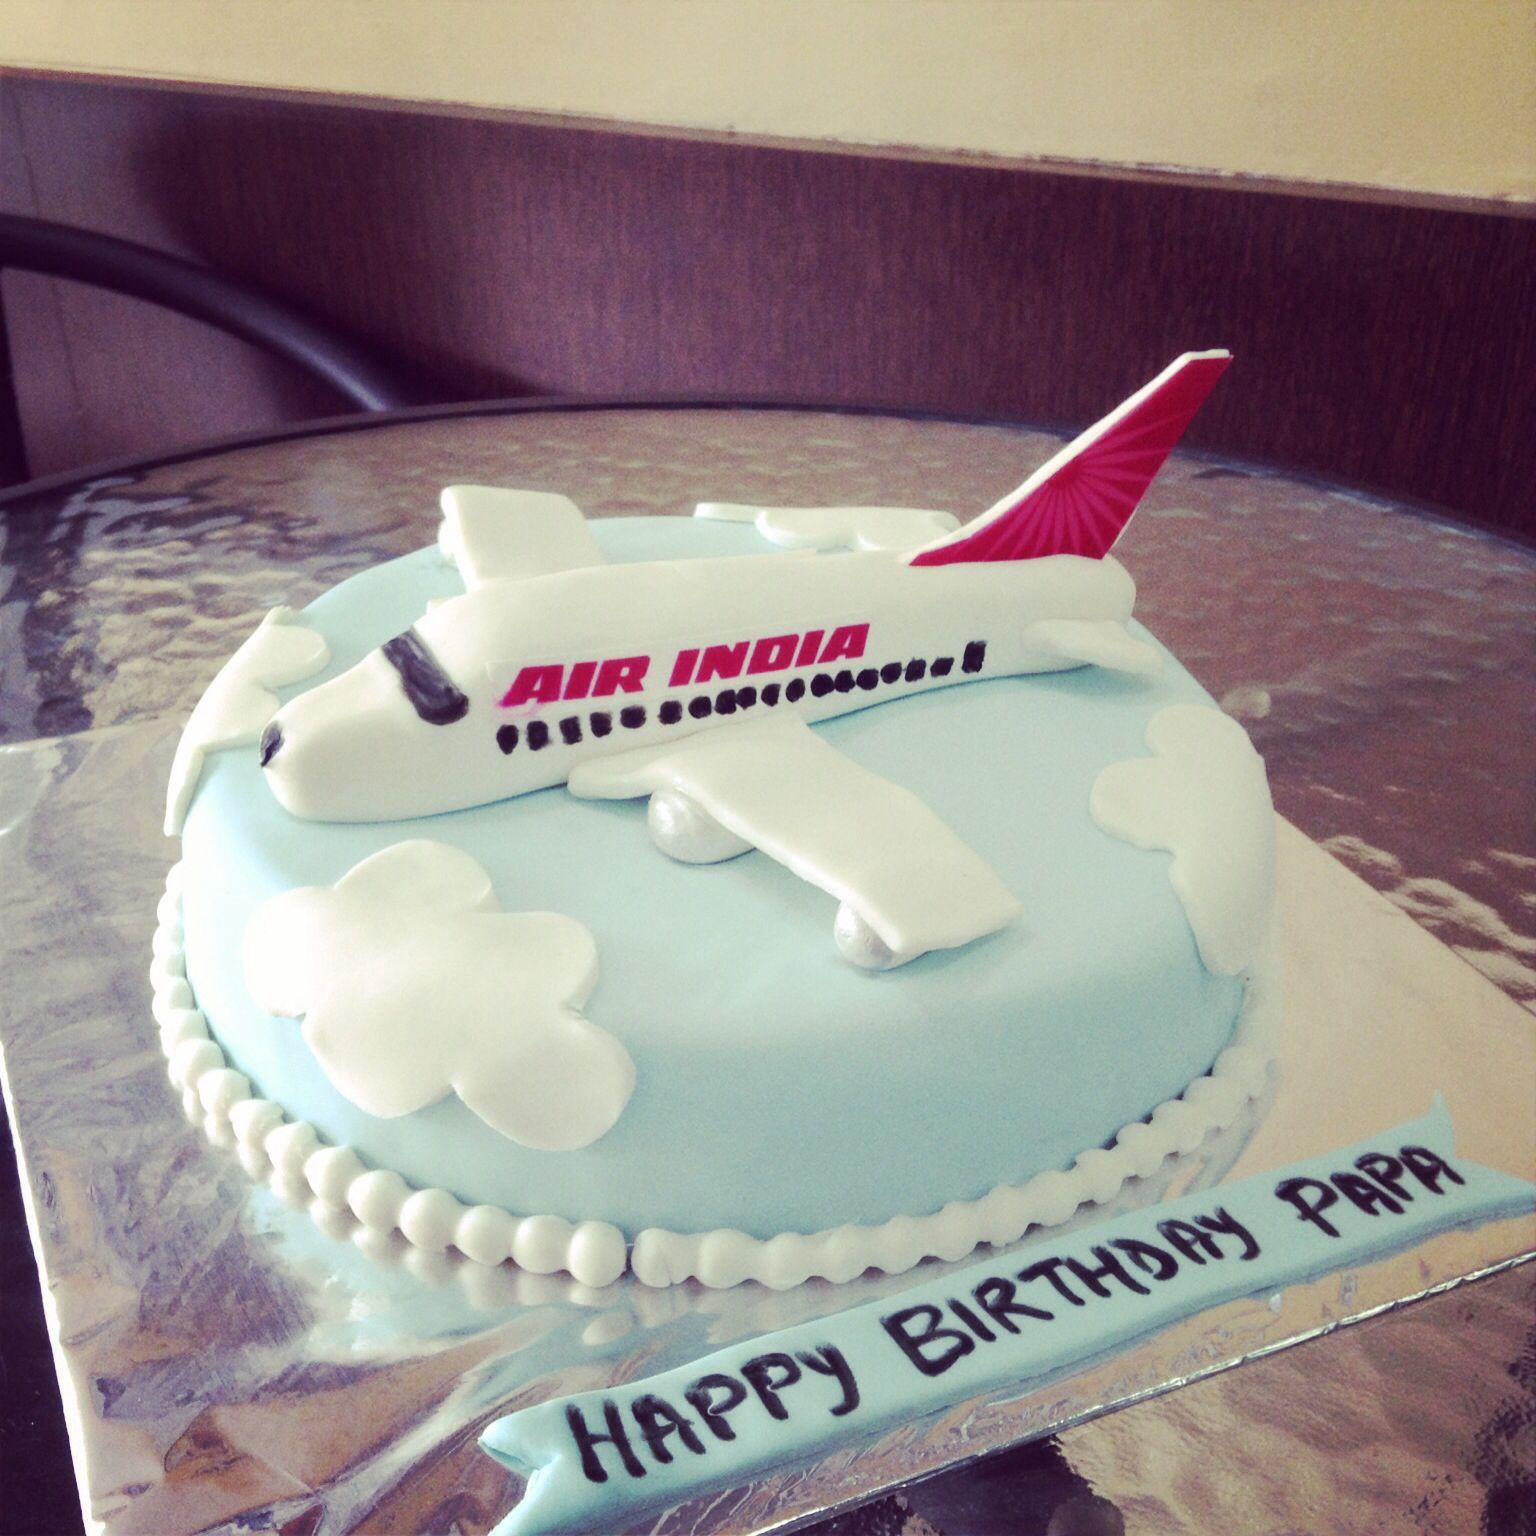 Aeroplane theme cake for a pilot The Sugar FanciesVadodara